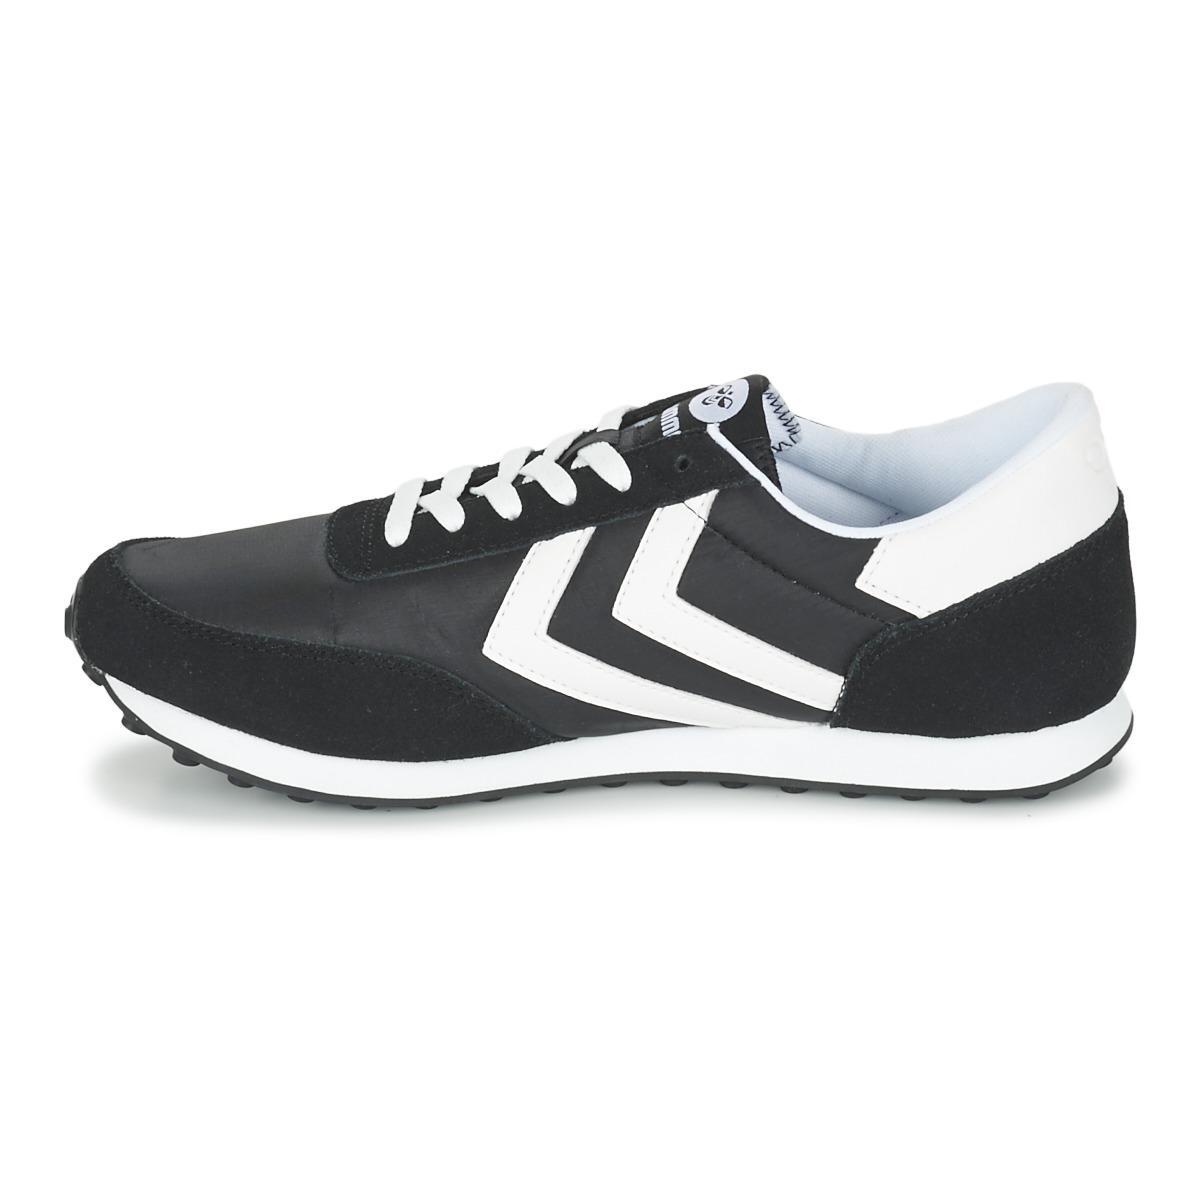 SEVENTYONE SPORT Chaussures Hummel en coloris Noir